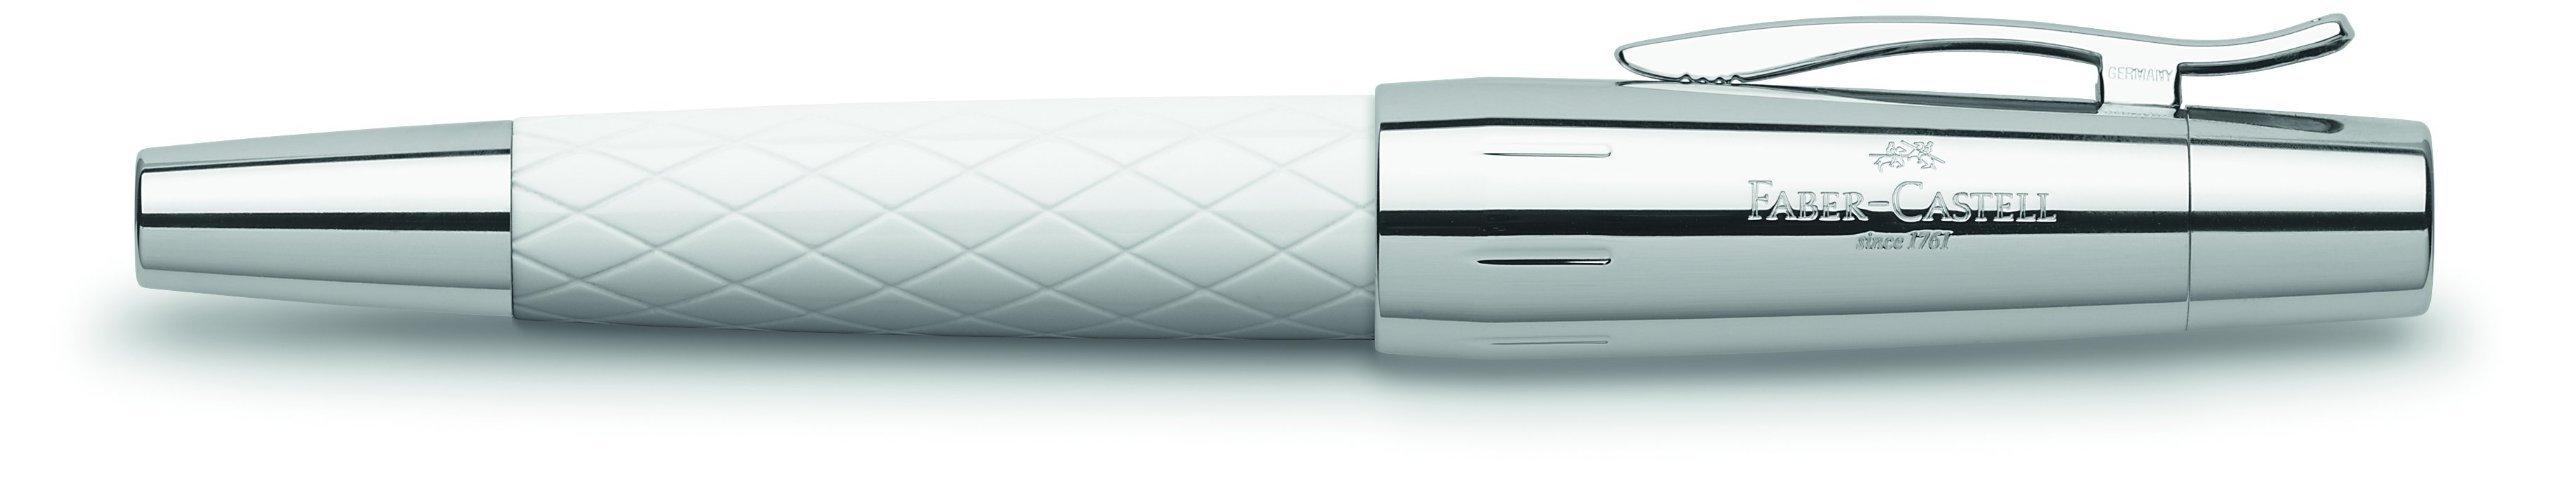 Faber-Castell E-Motion Range Rollerball Rhombus White by Faber-Castell (Image #1)